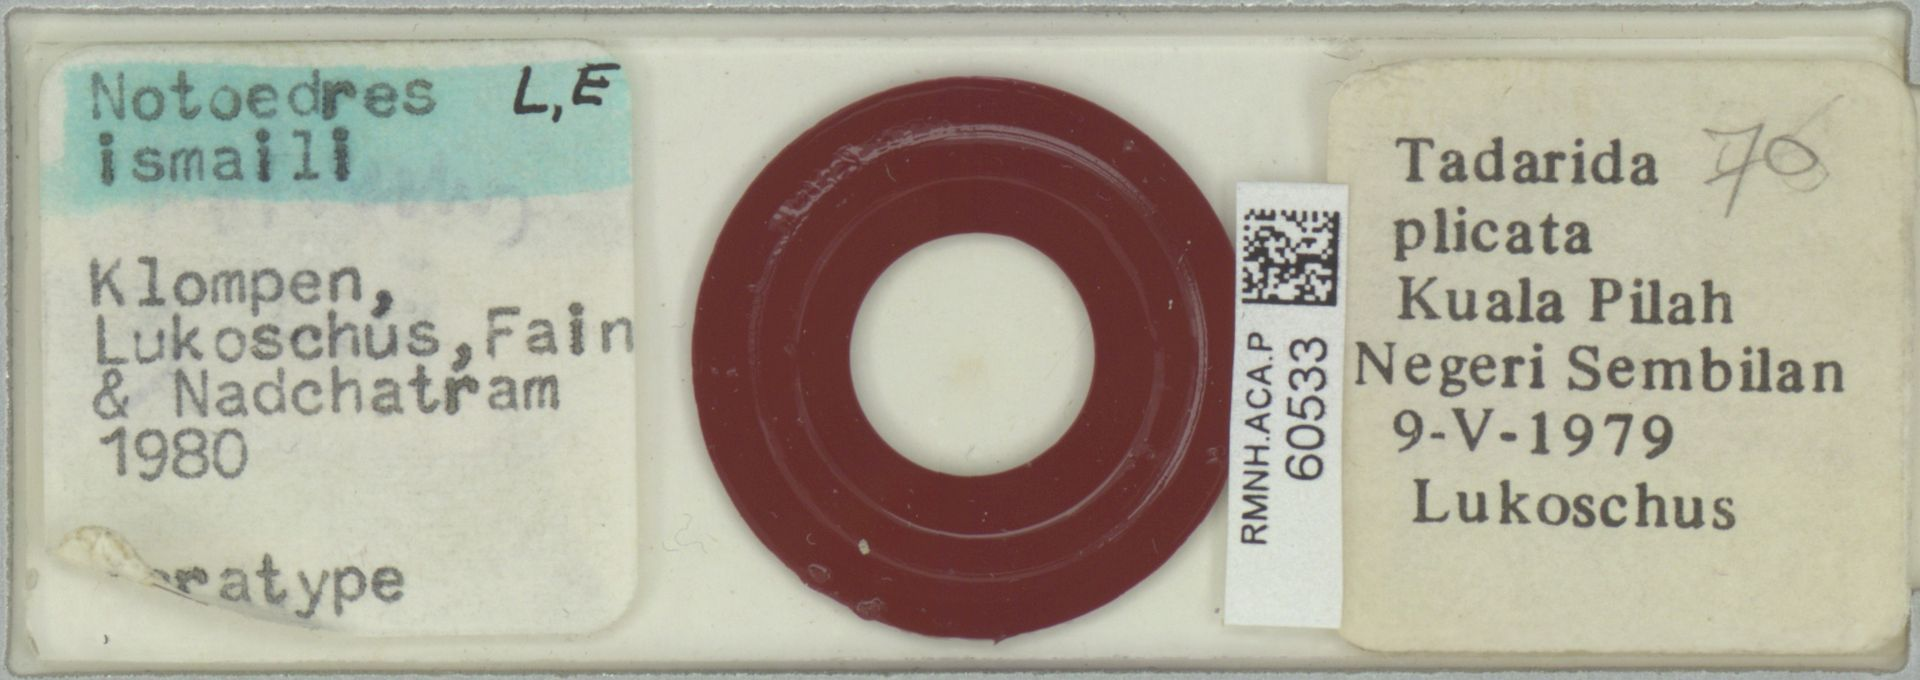 RMNH.ACA.P.60533 | Notoedres ismaili Klompen, Lukoschus, Fain & Nadchatram 1980